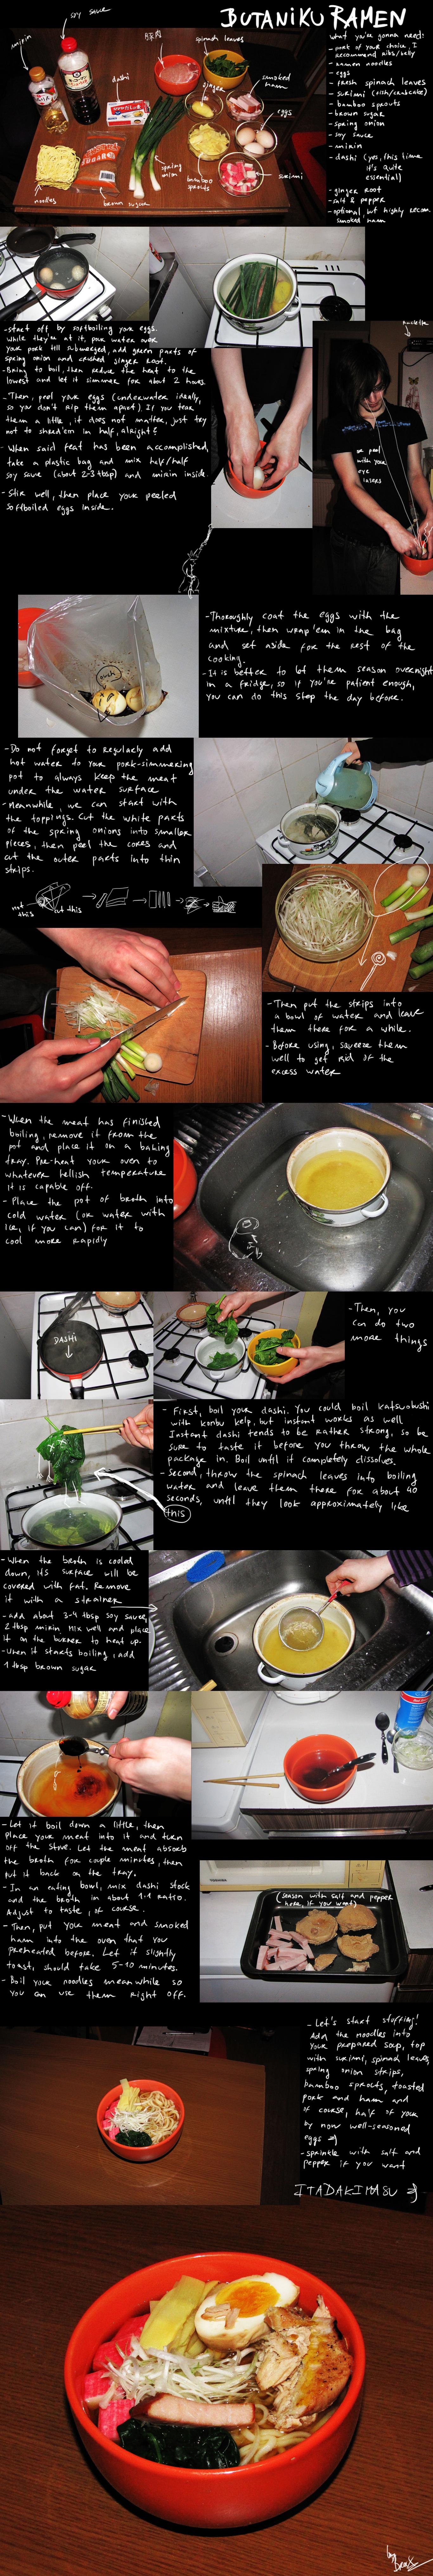 How to make butaniku ramen by BrocX